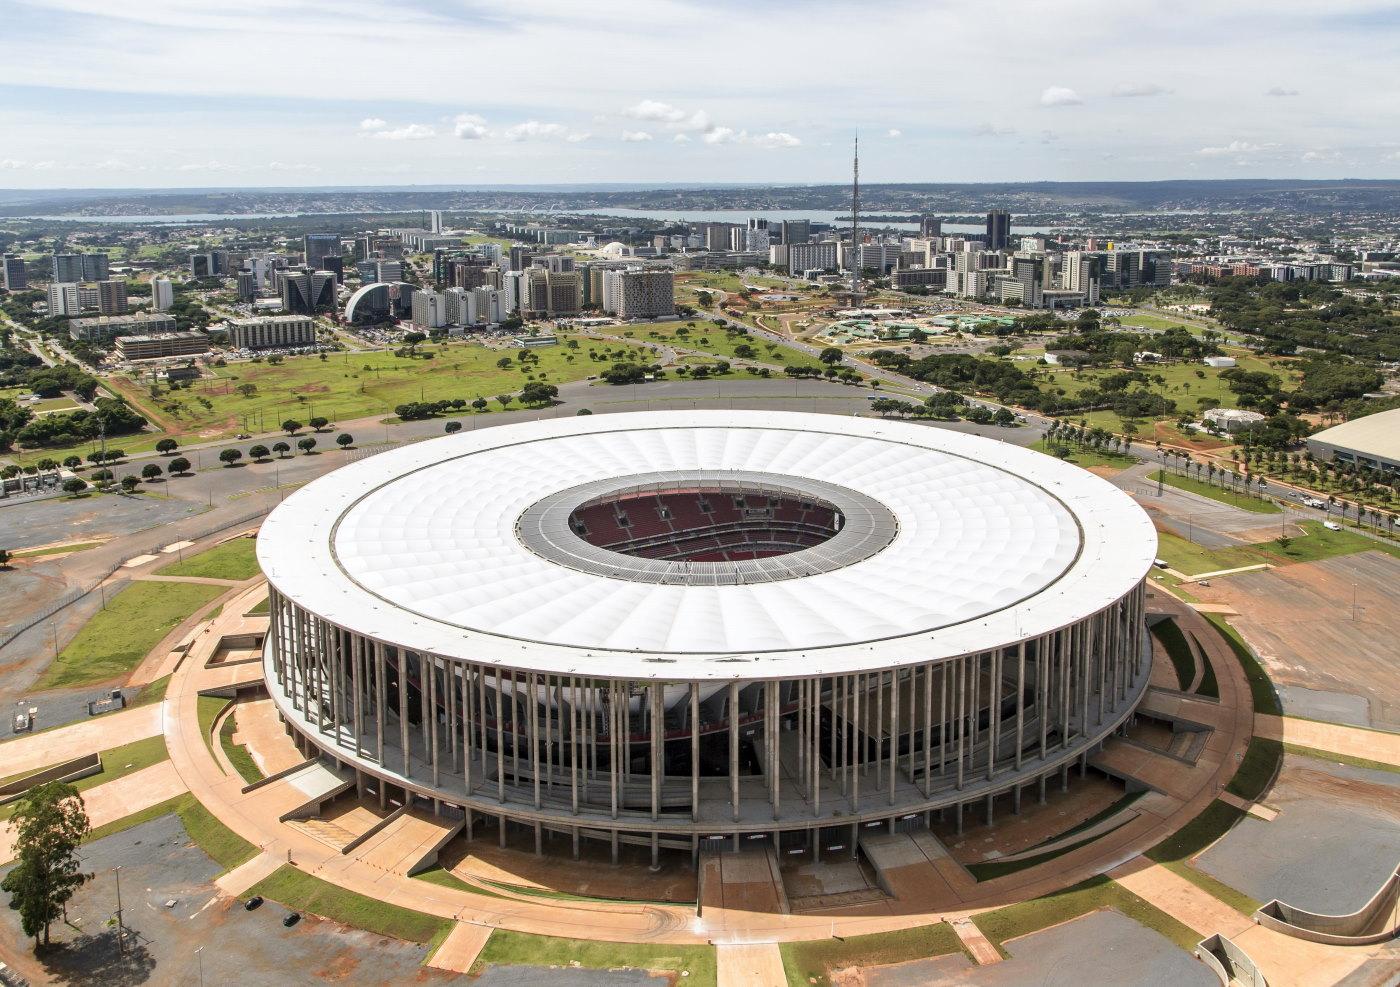 Estádio Nacional Mané Garrincha will host the Copa America 2021 Argentina vs Colombia.